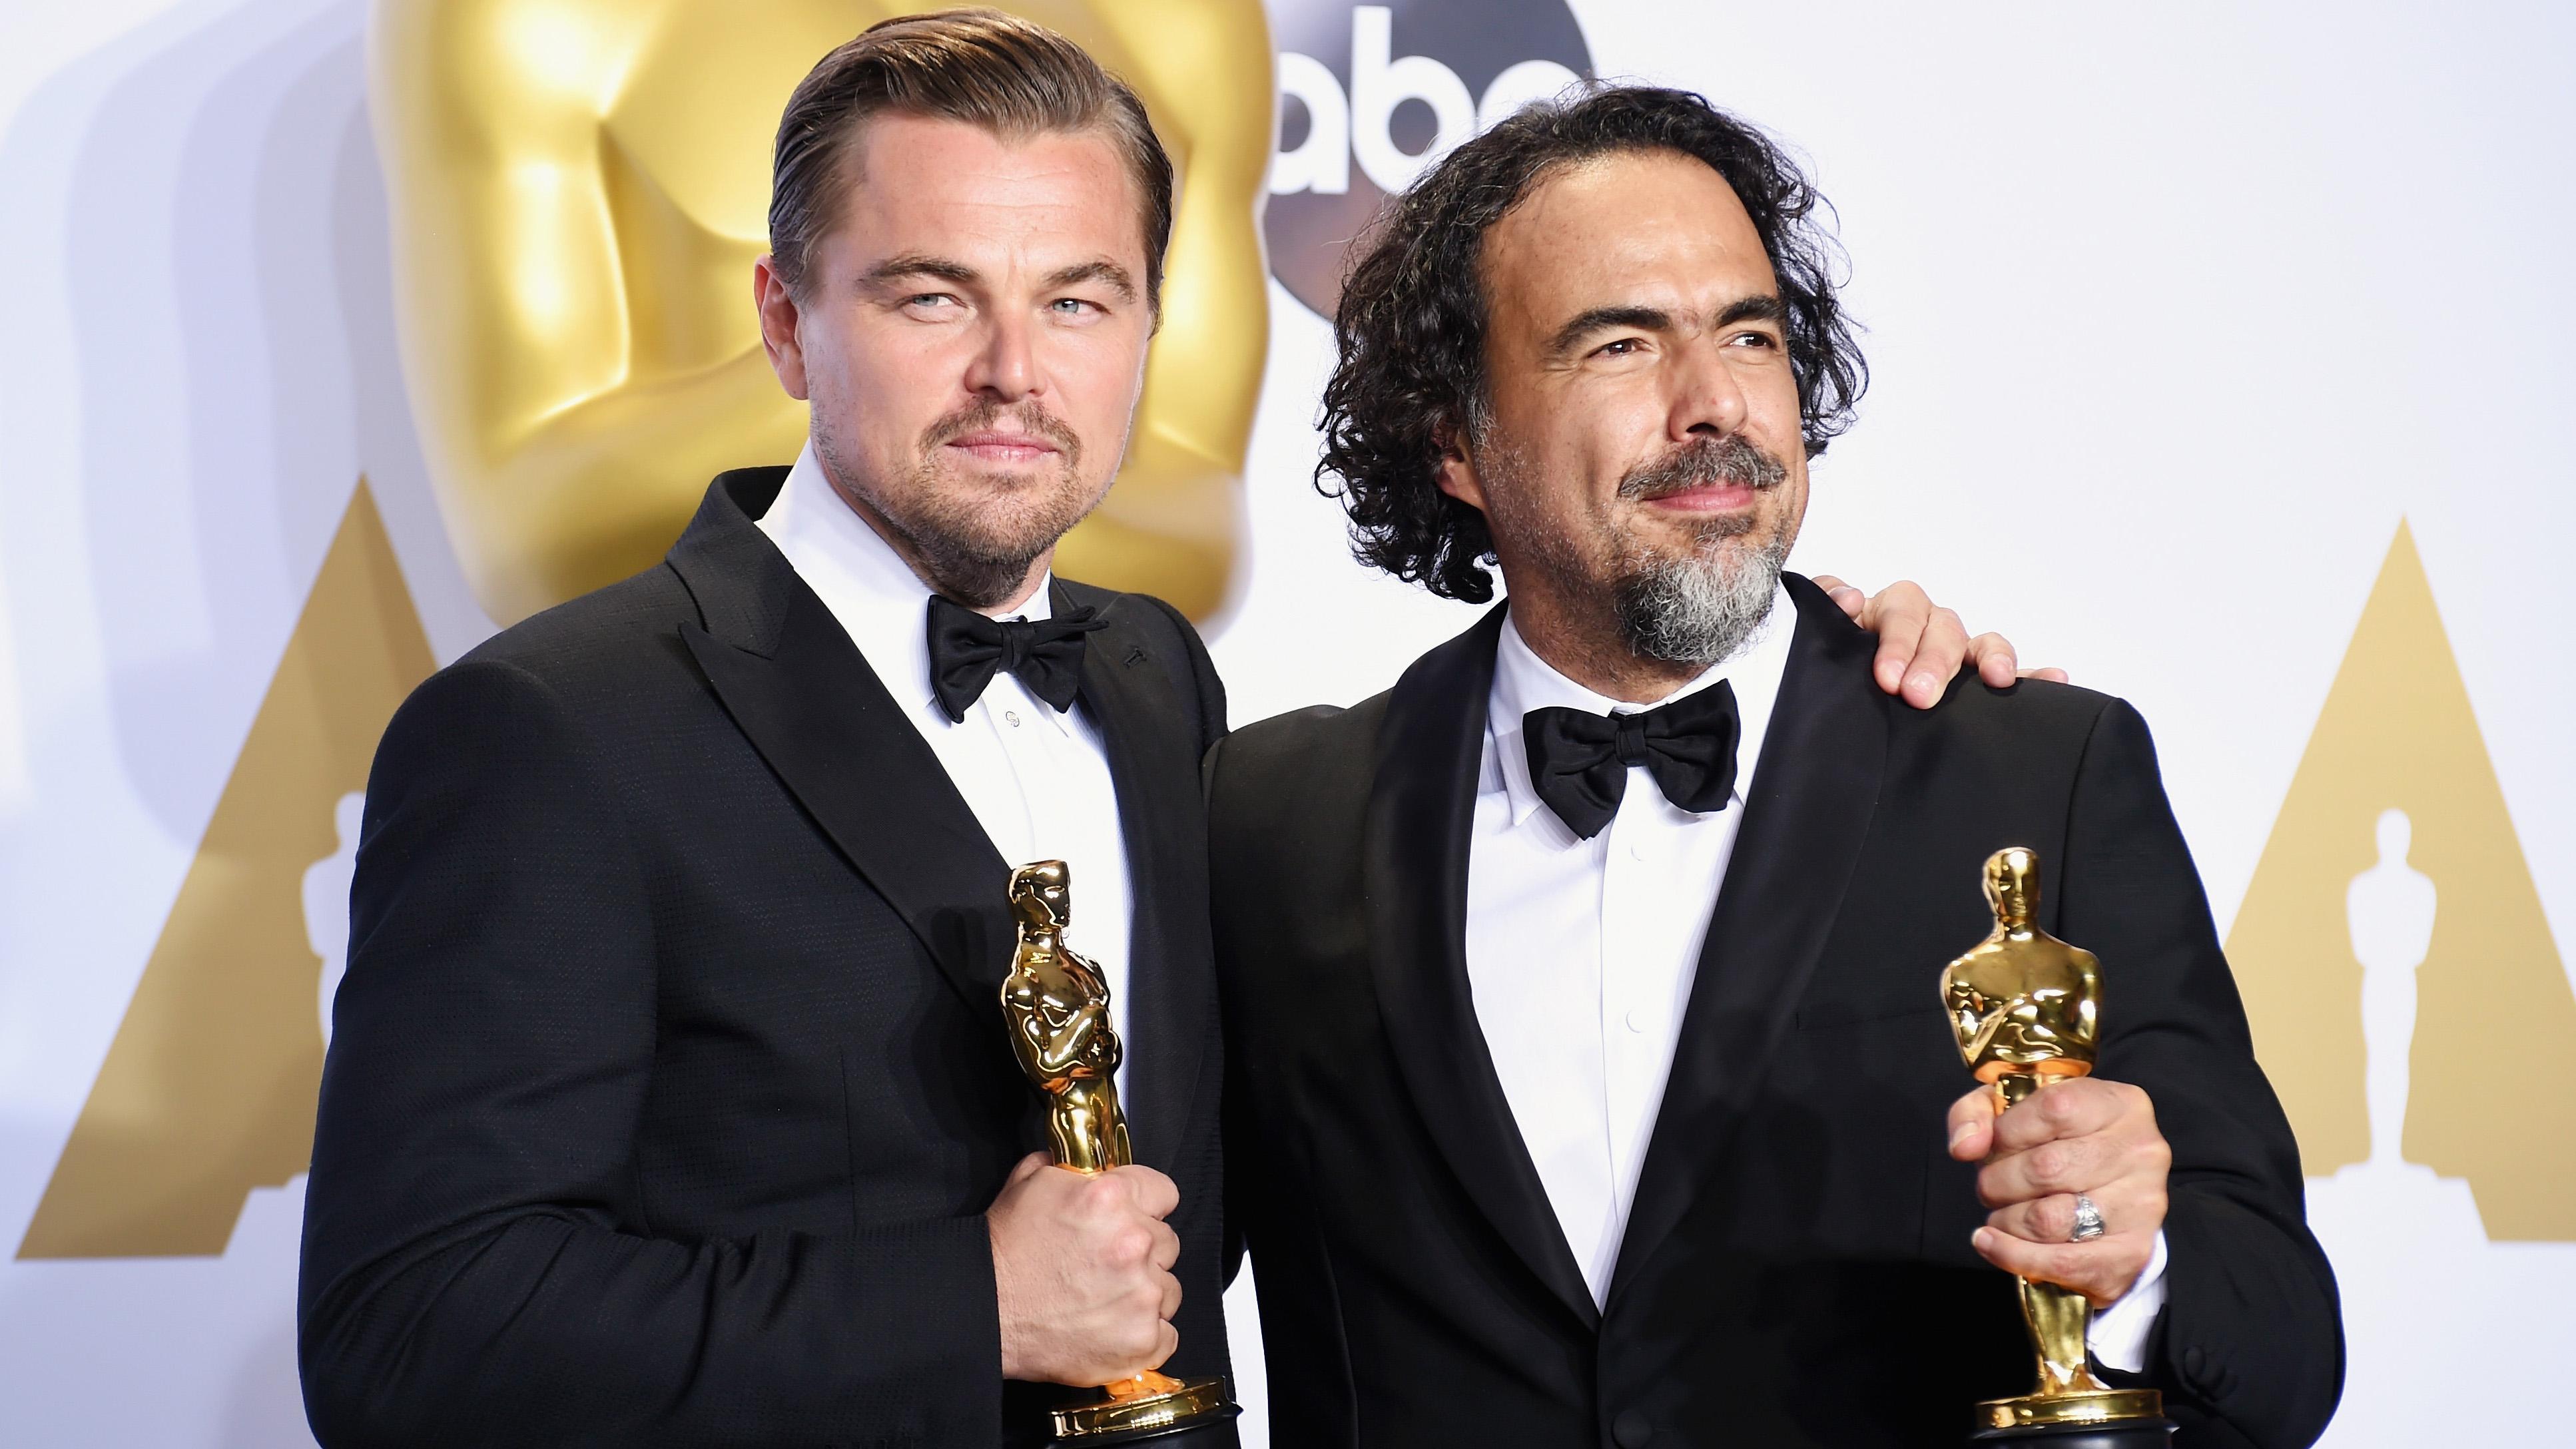 'The Revenant' won big at the Oscars, with Leonardo DiCaprio claiming best actor and Alejandro Gonzalez Inarritu winning best director on Feb. 28, 2016. FILMMAGIC/Jeff Kravitz.